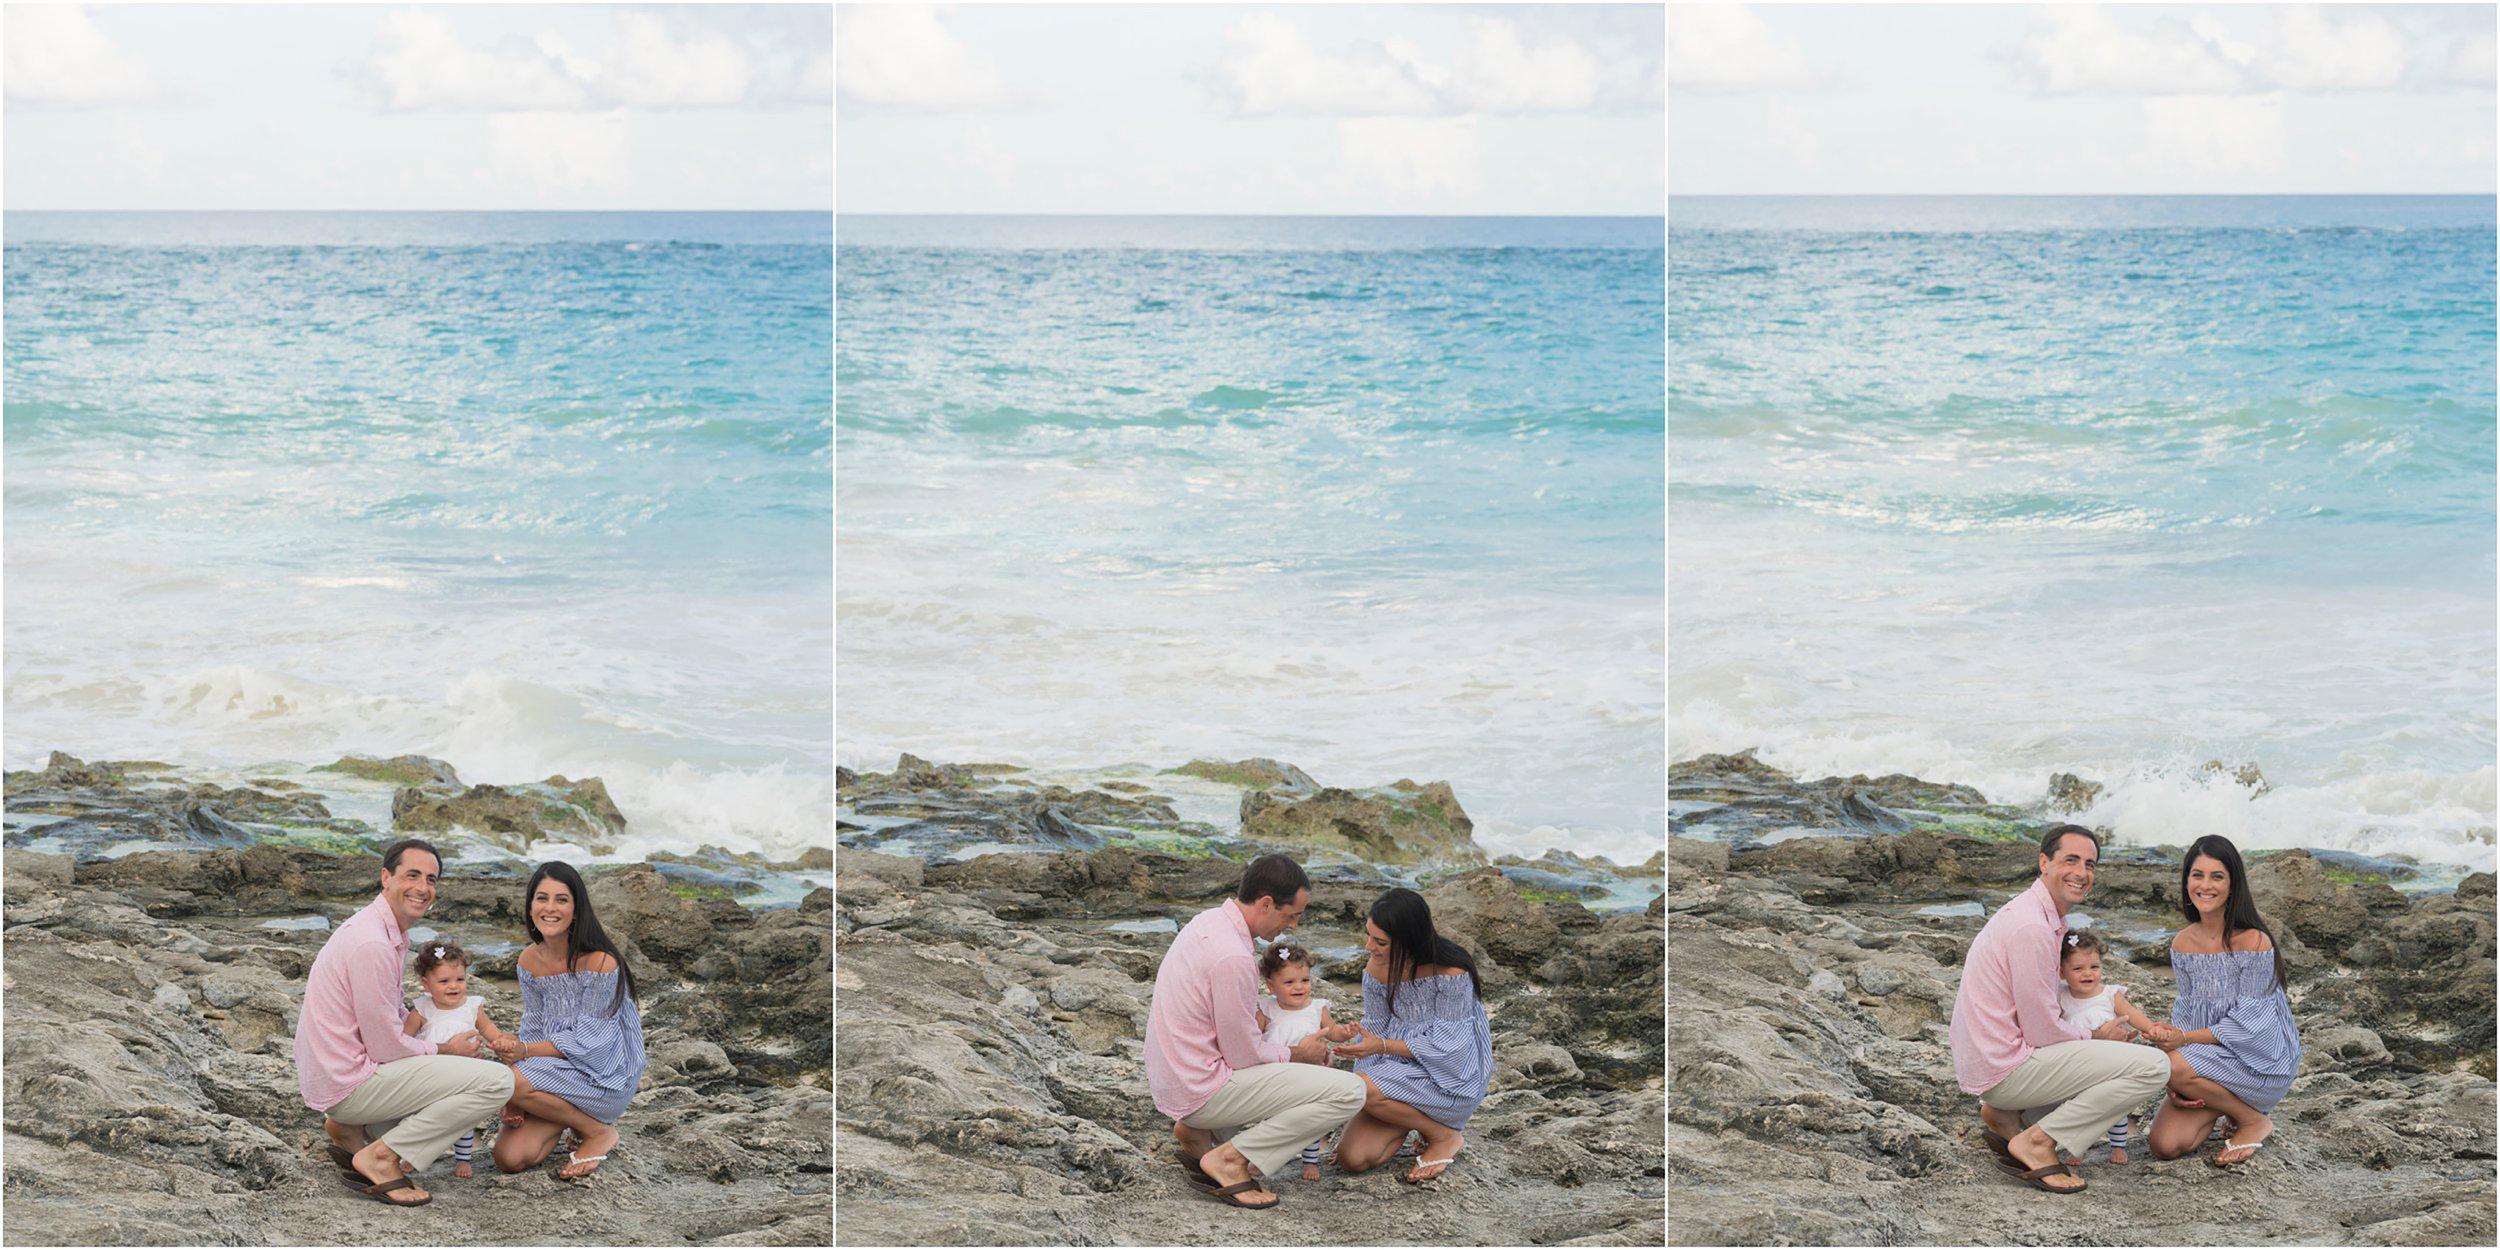 ©FianderFoto_Bermuda Photographer_Grape Bay_Family_Dughi_013.jpg